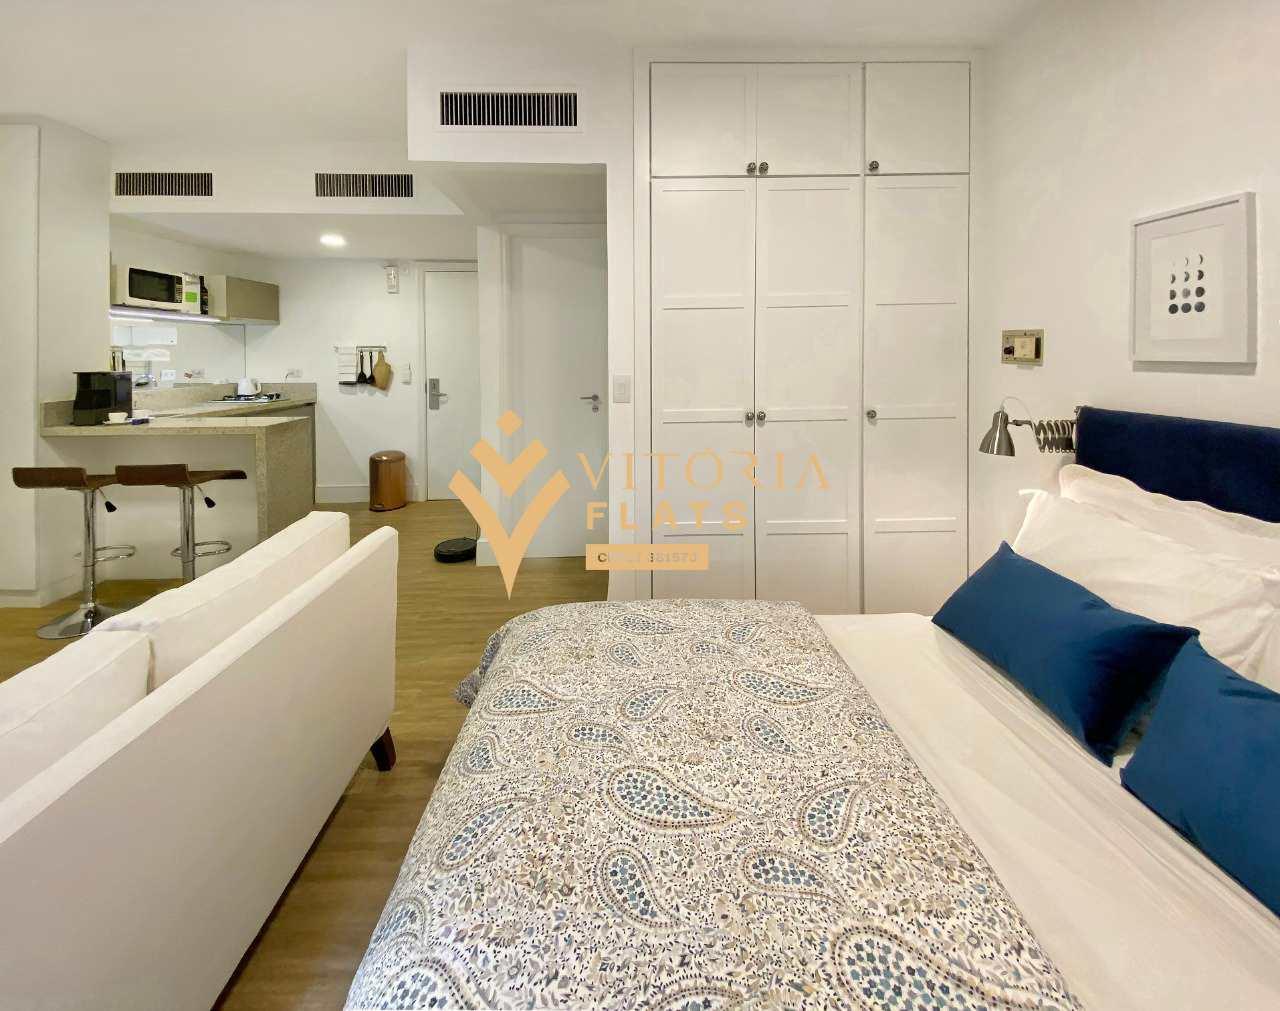 Flat com 1 dorm, Jardim Paulista, São Paulo, Cod: 64441804